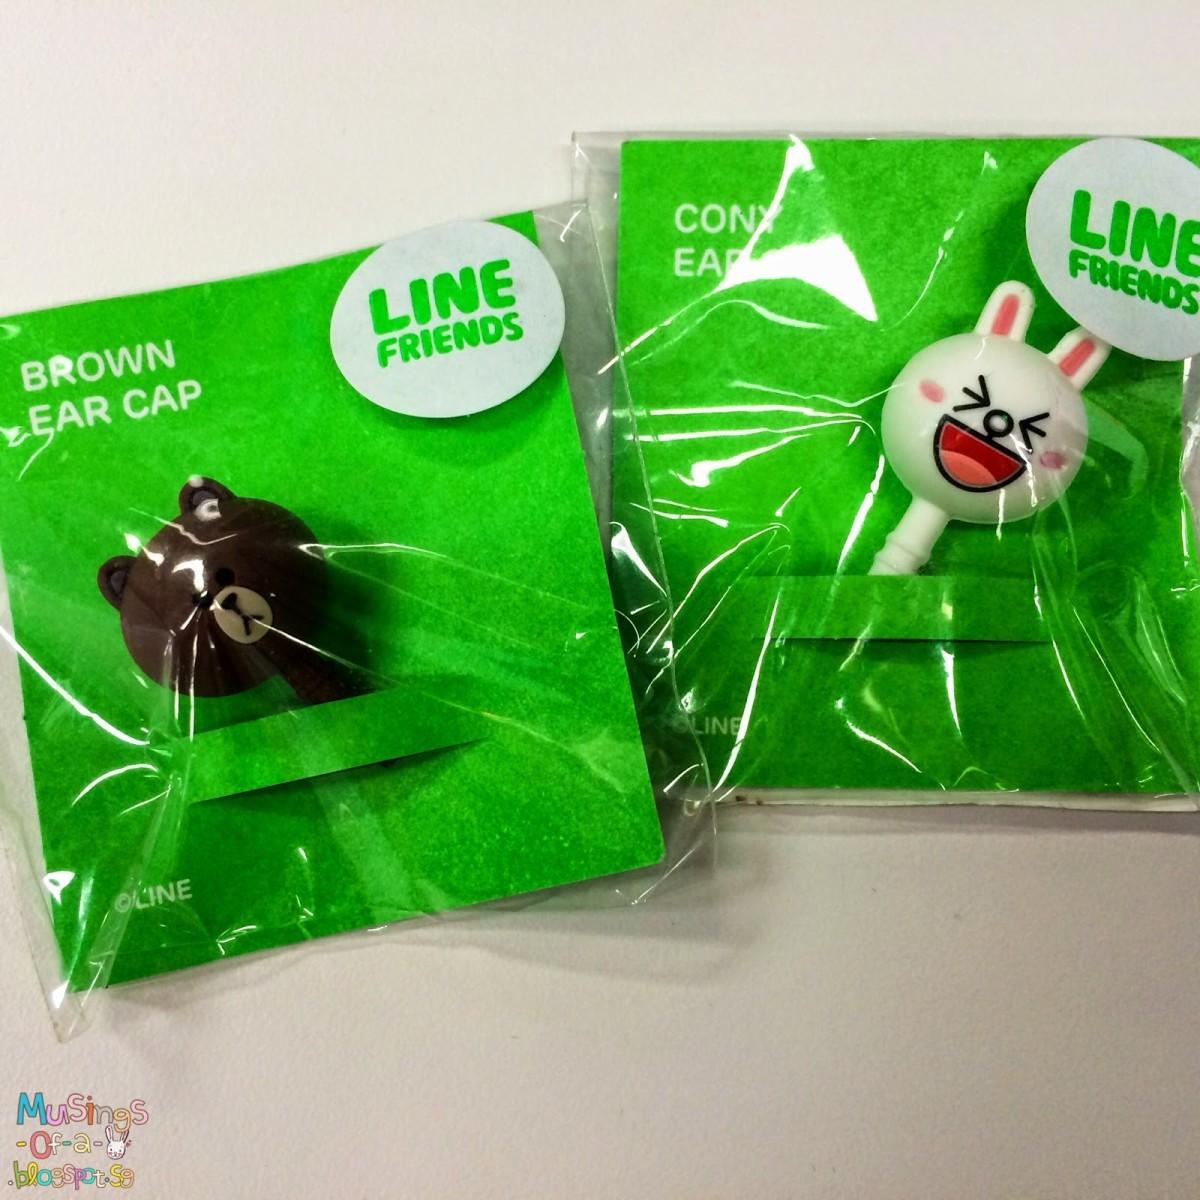 LINE Pop-Up Store